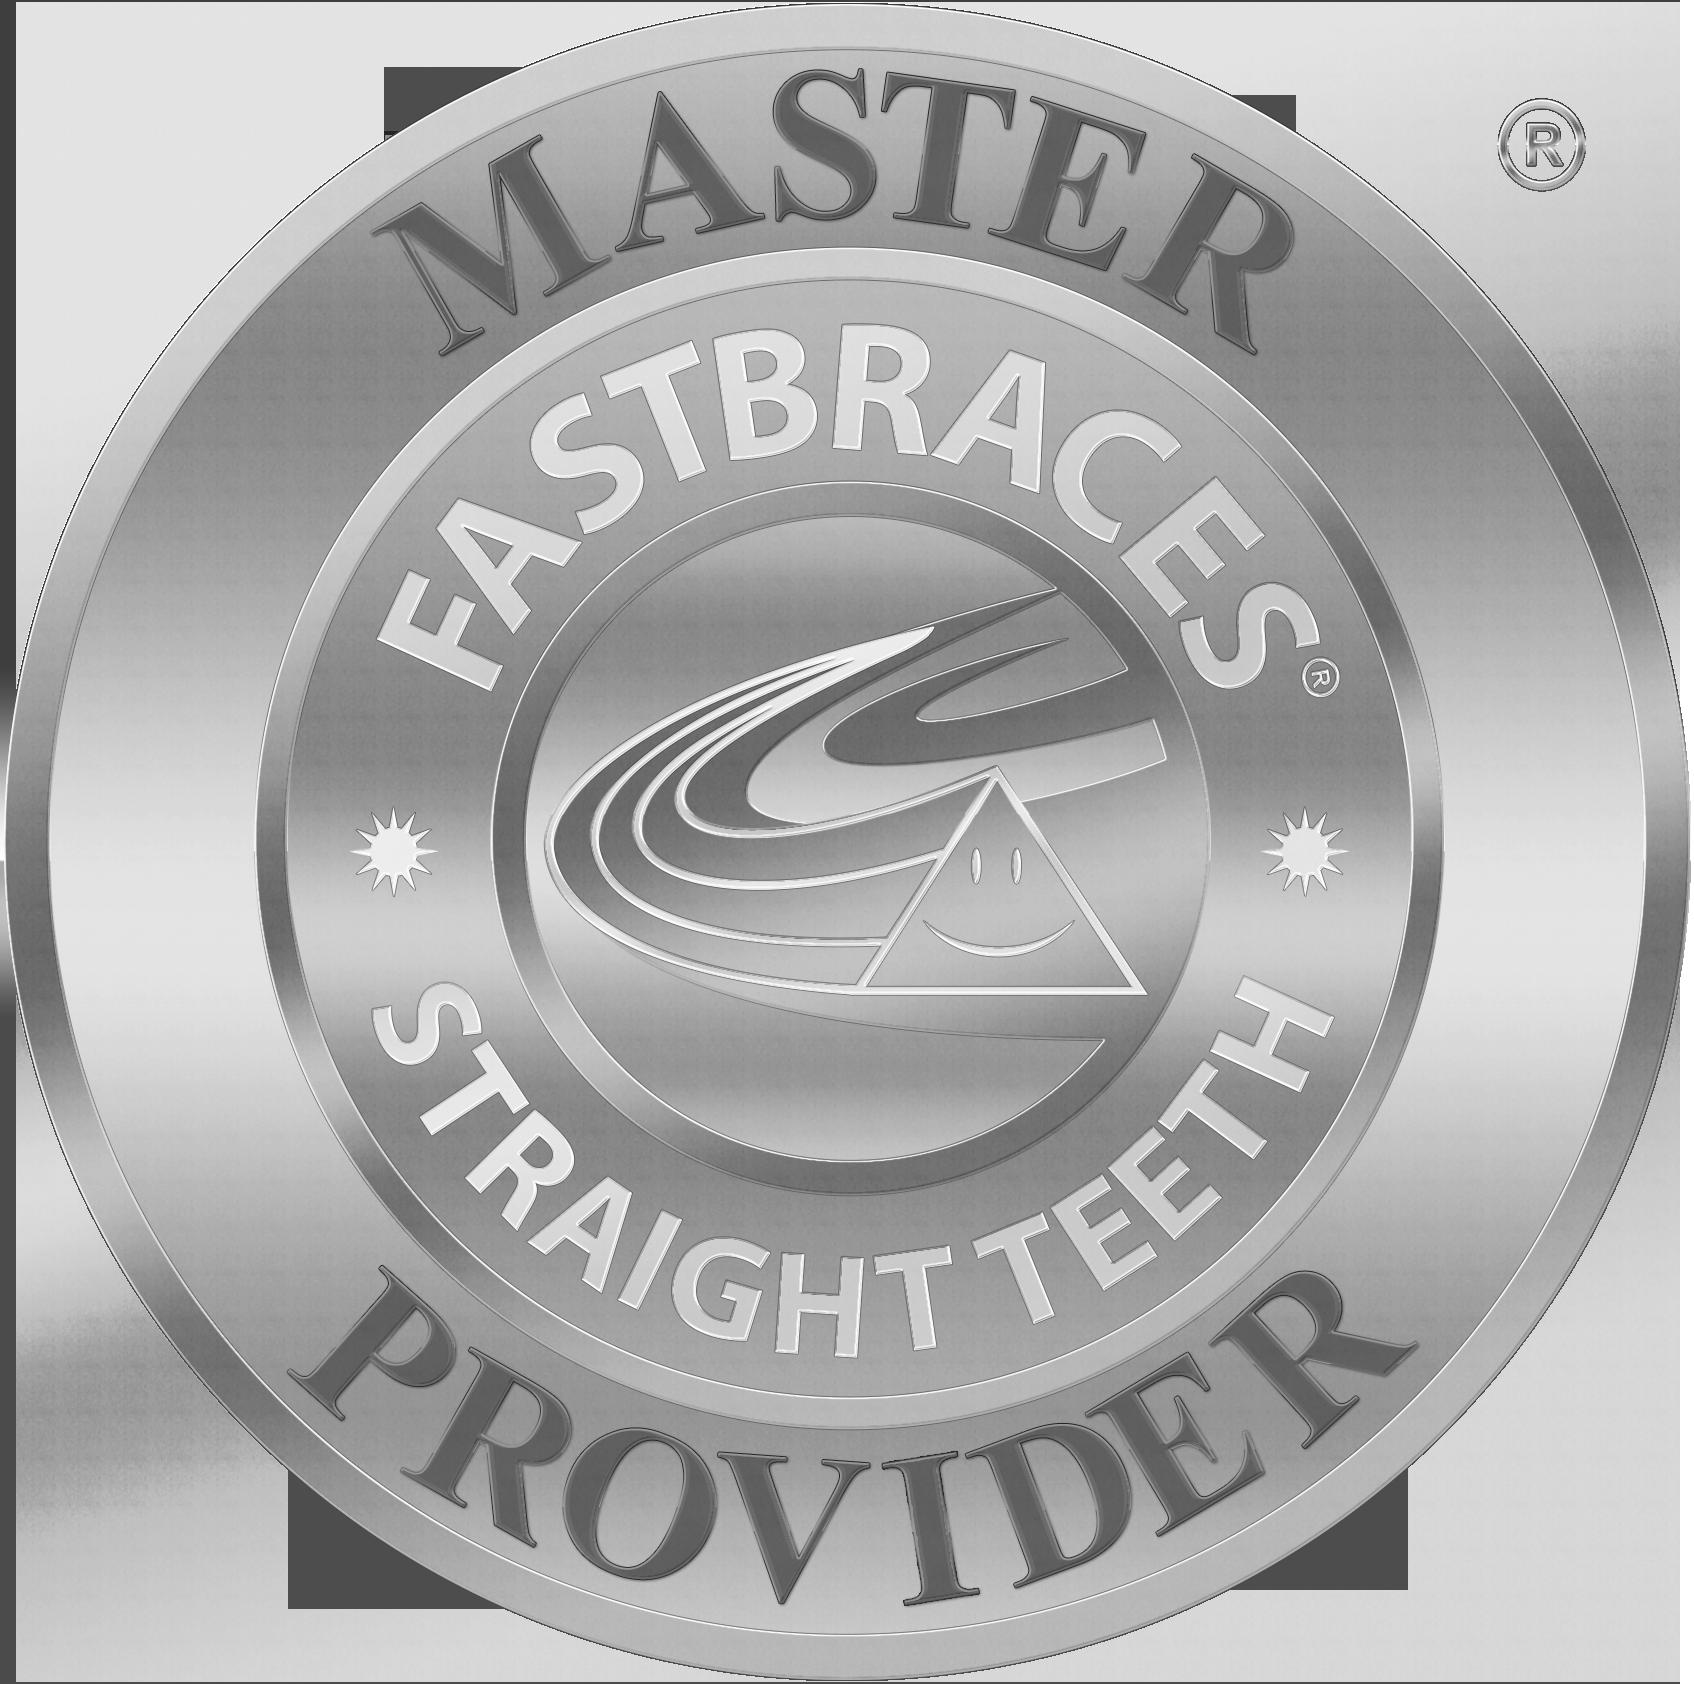 Fastbraces Master provider Inverness, Aviemore